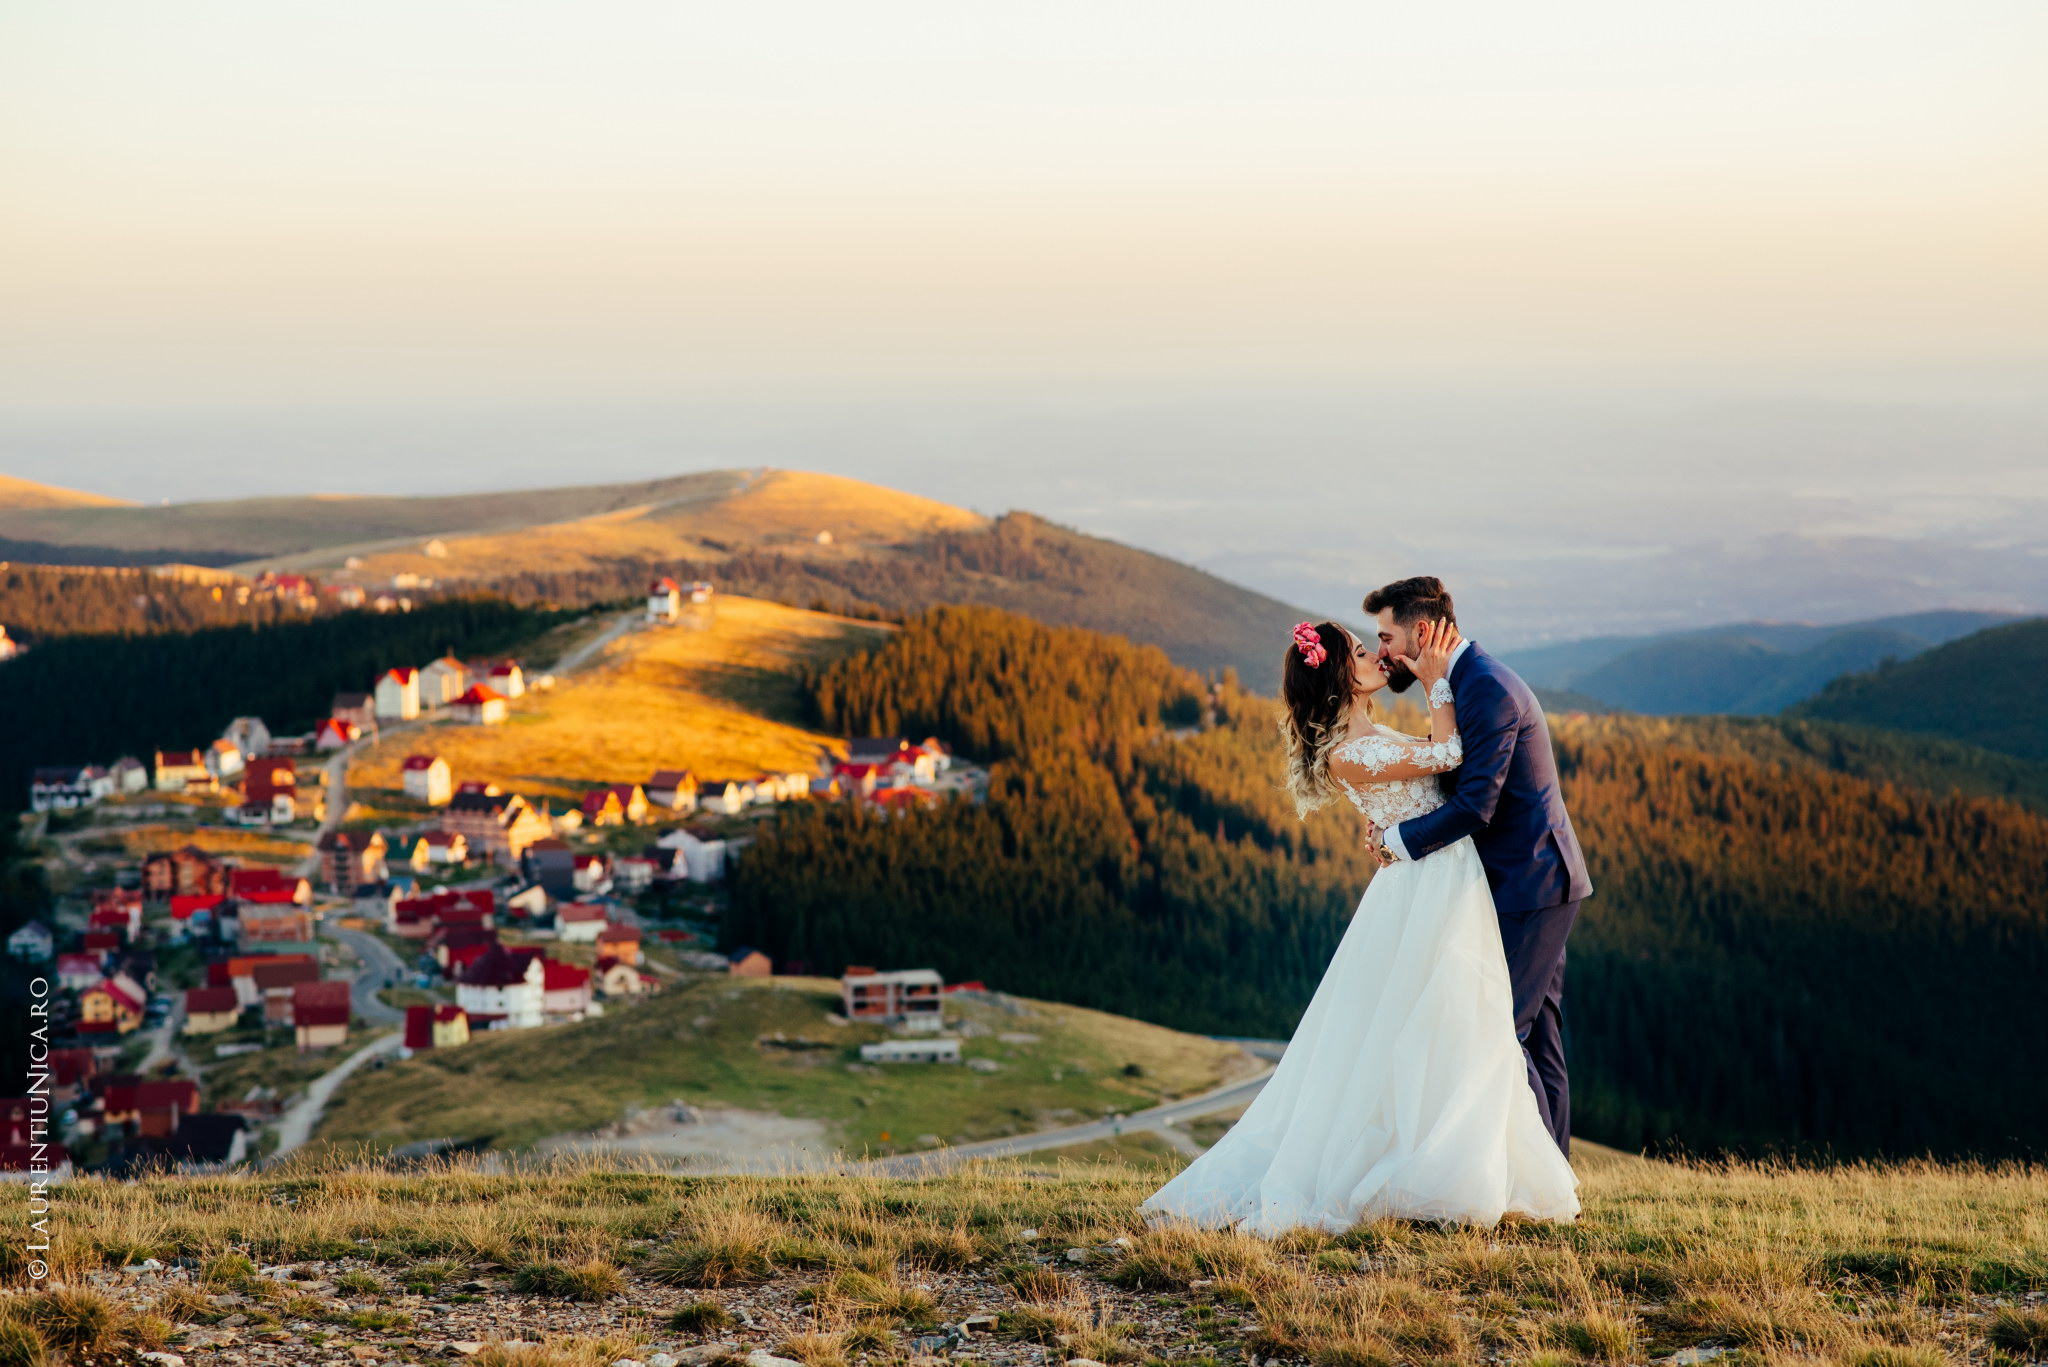 aida si alin fotograf nunta laurentiu nica transalpina 28 - Aida & Alin | Fotografii After Wedding | Transalpina - Muntii Parang